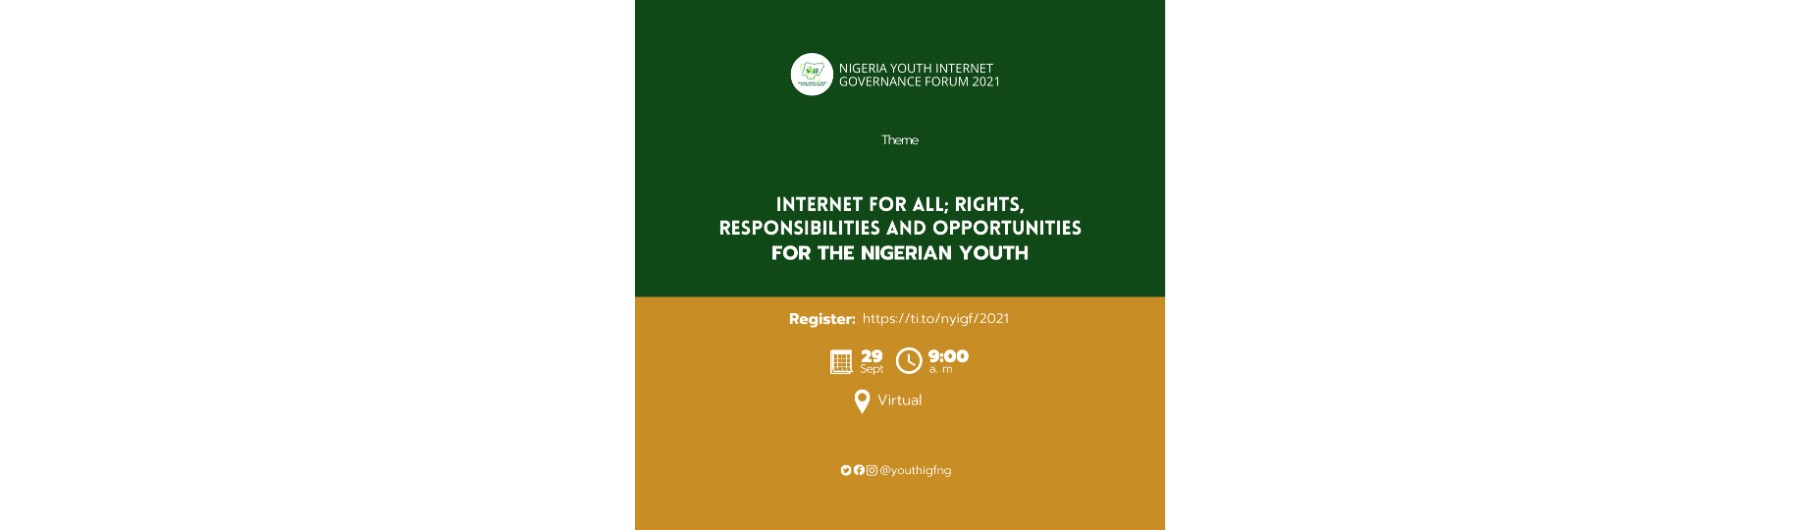 Nigeria Youth Internet Governance Forum 2021